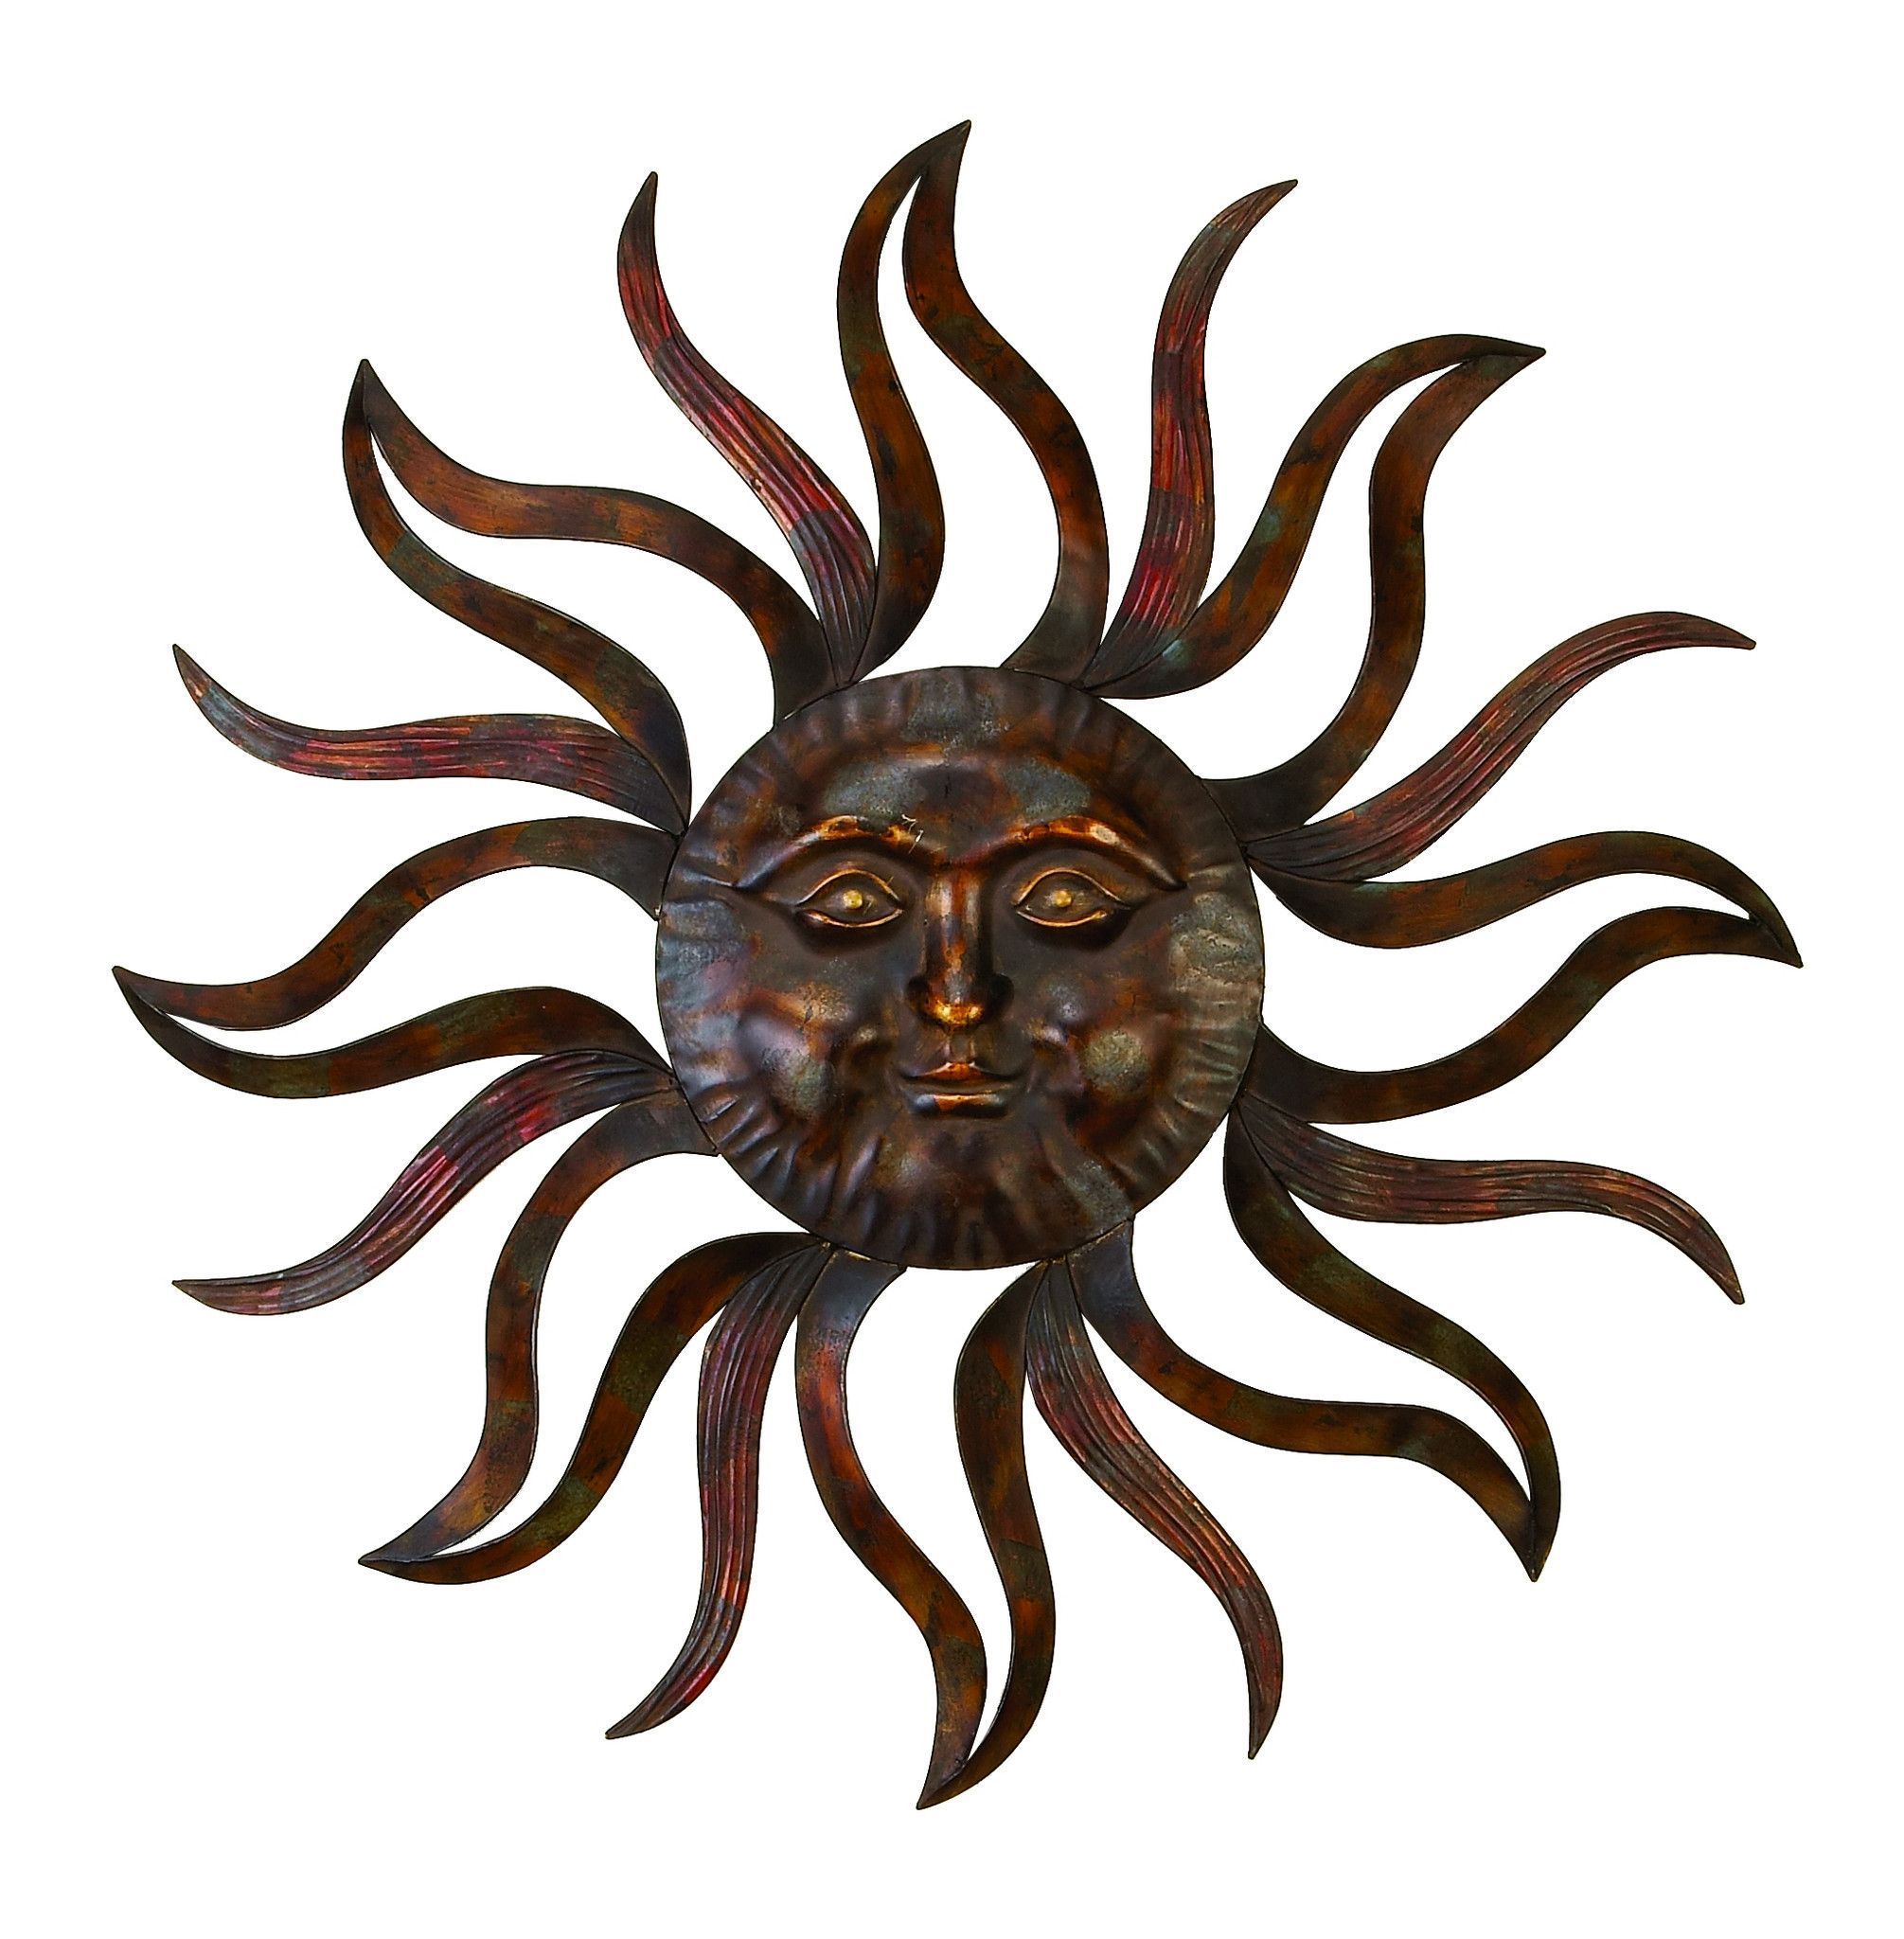 35 large brown metal sun face wall art sculpture mystical decor